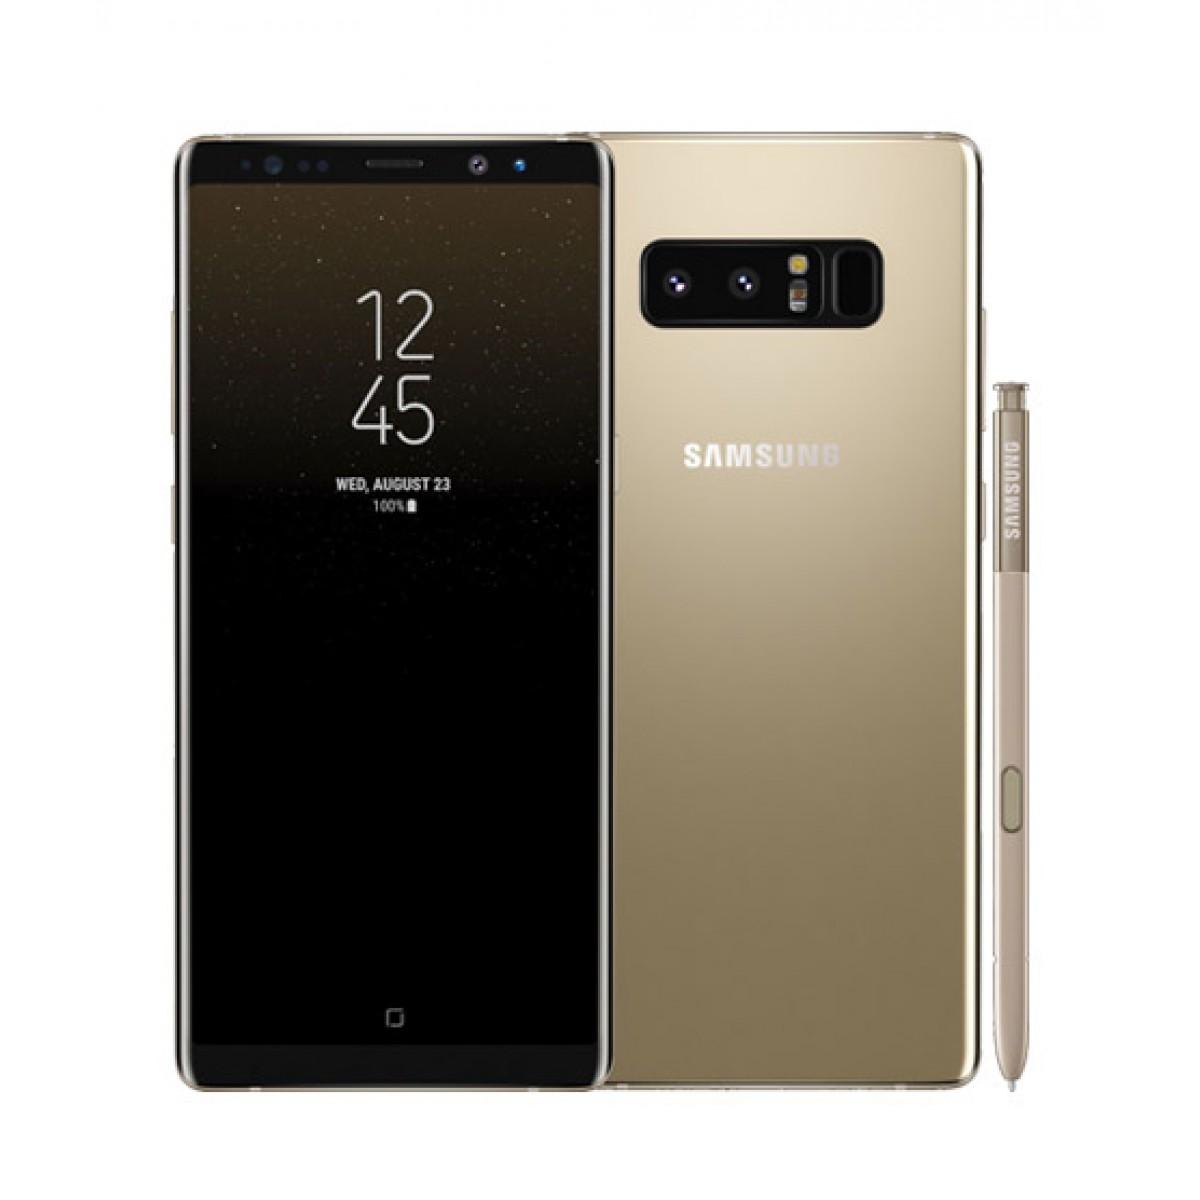 samsung galaxy note 8 64gb samsung galaxy note 8 64gb mobile phone Samsung Galaxy Note 8 64GB Mobile Phone Samsung Galaxy Note 8 64GB